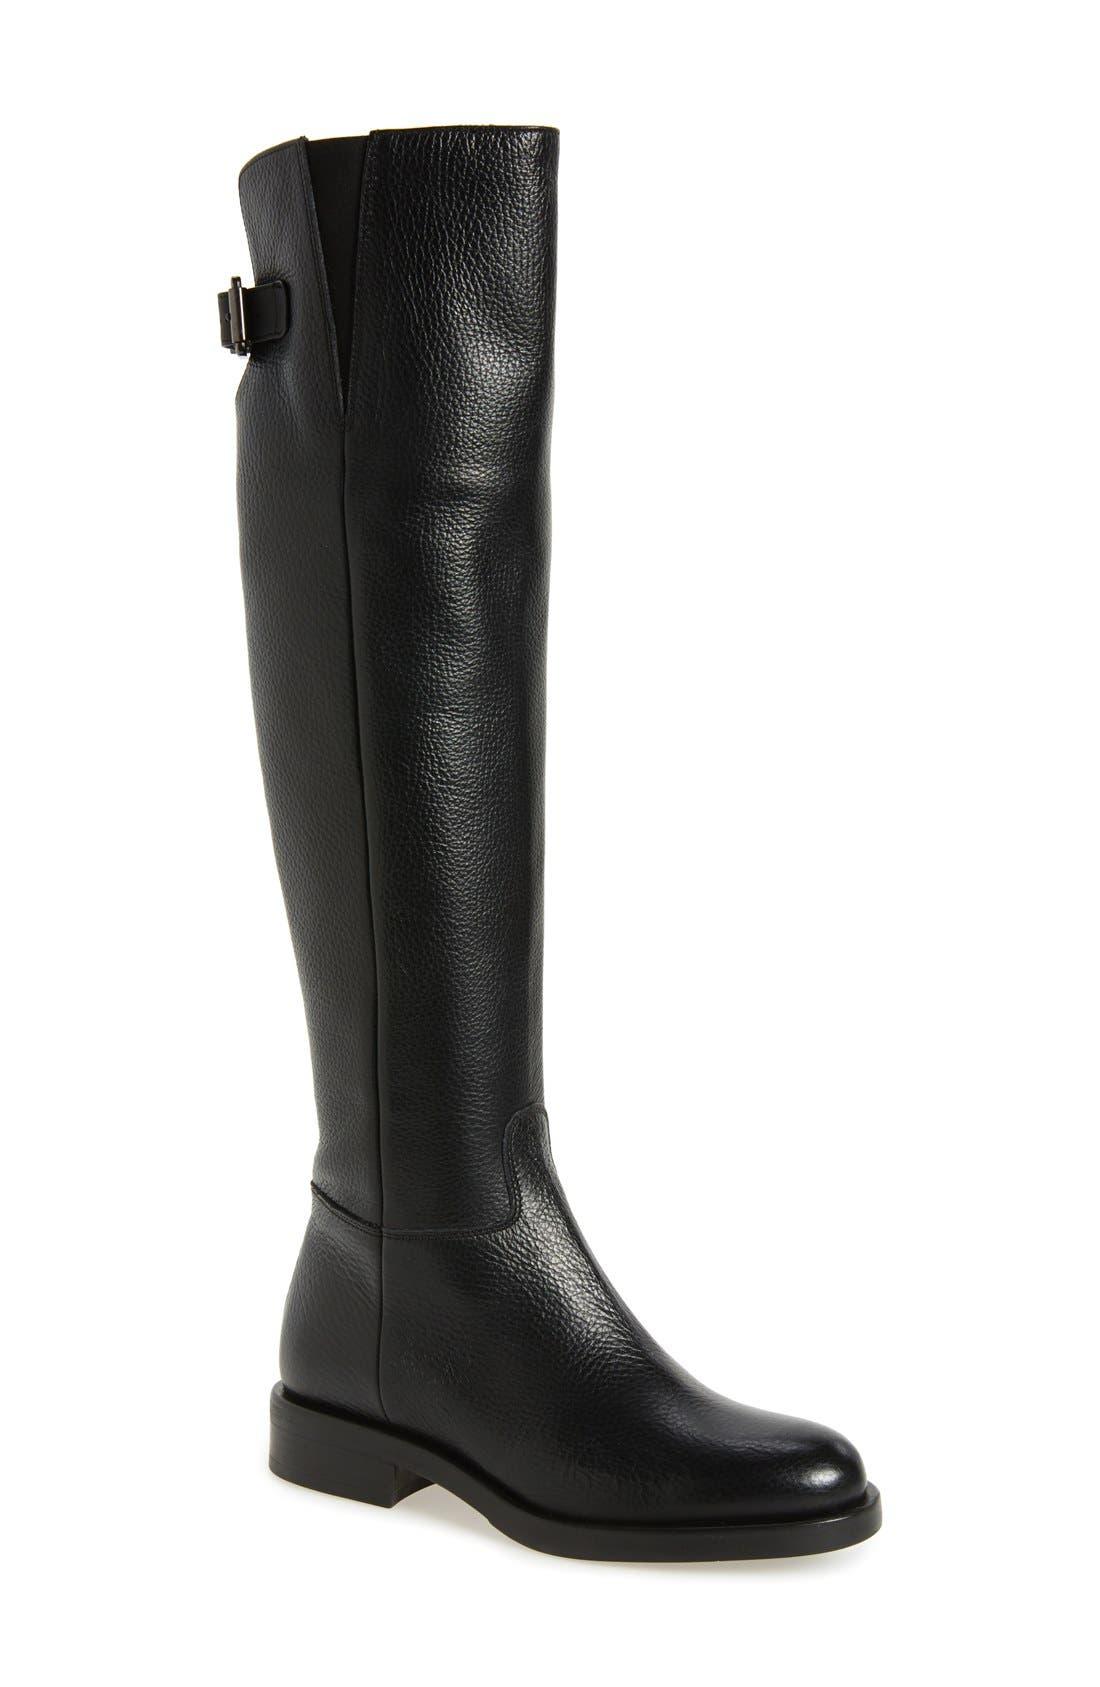 Main Image - Tiffi Tall Riding Boot (Women)